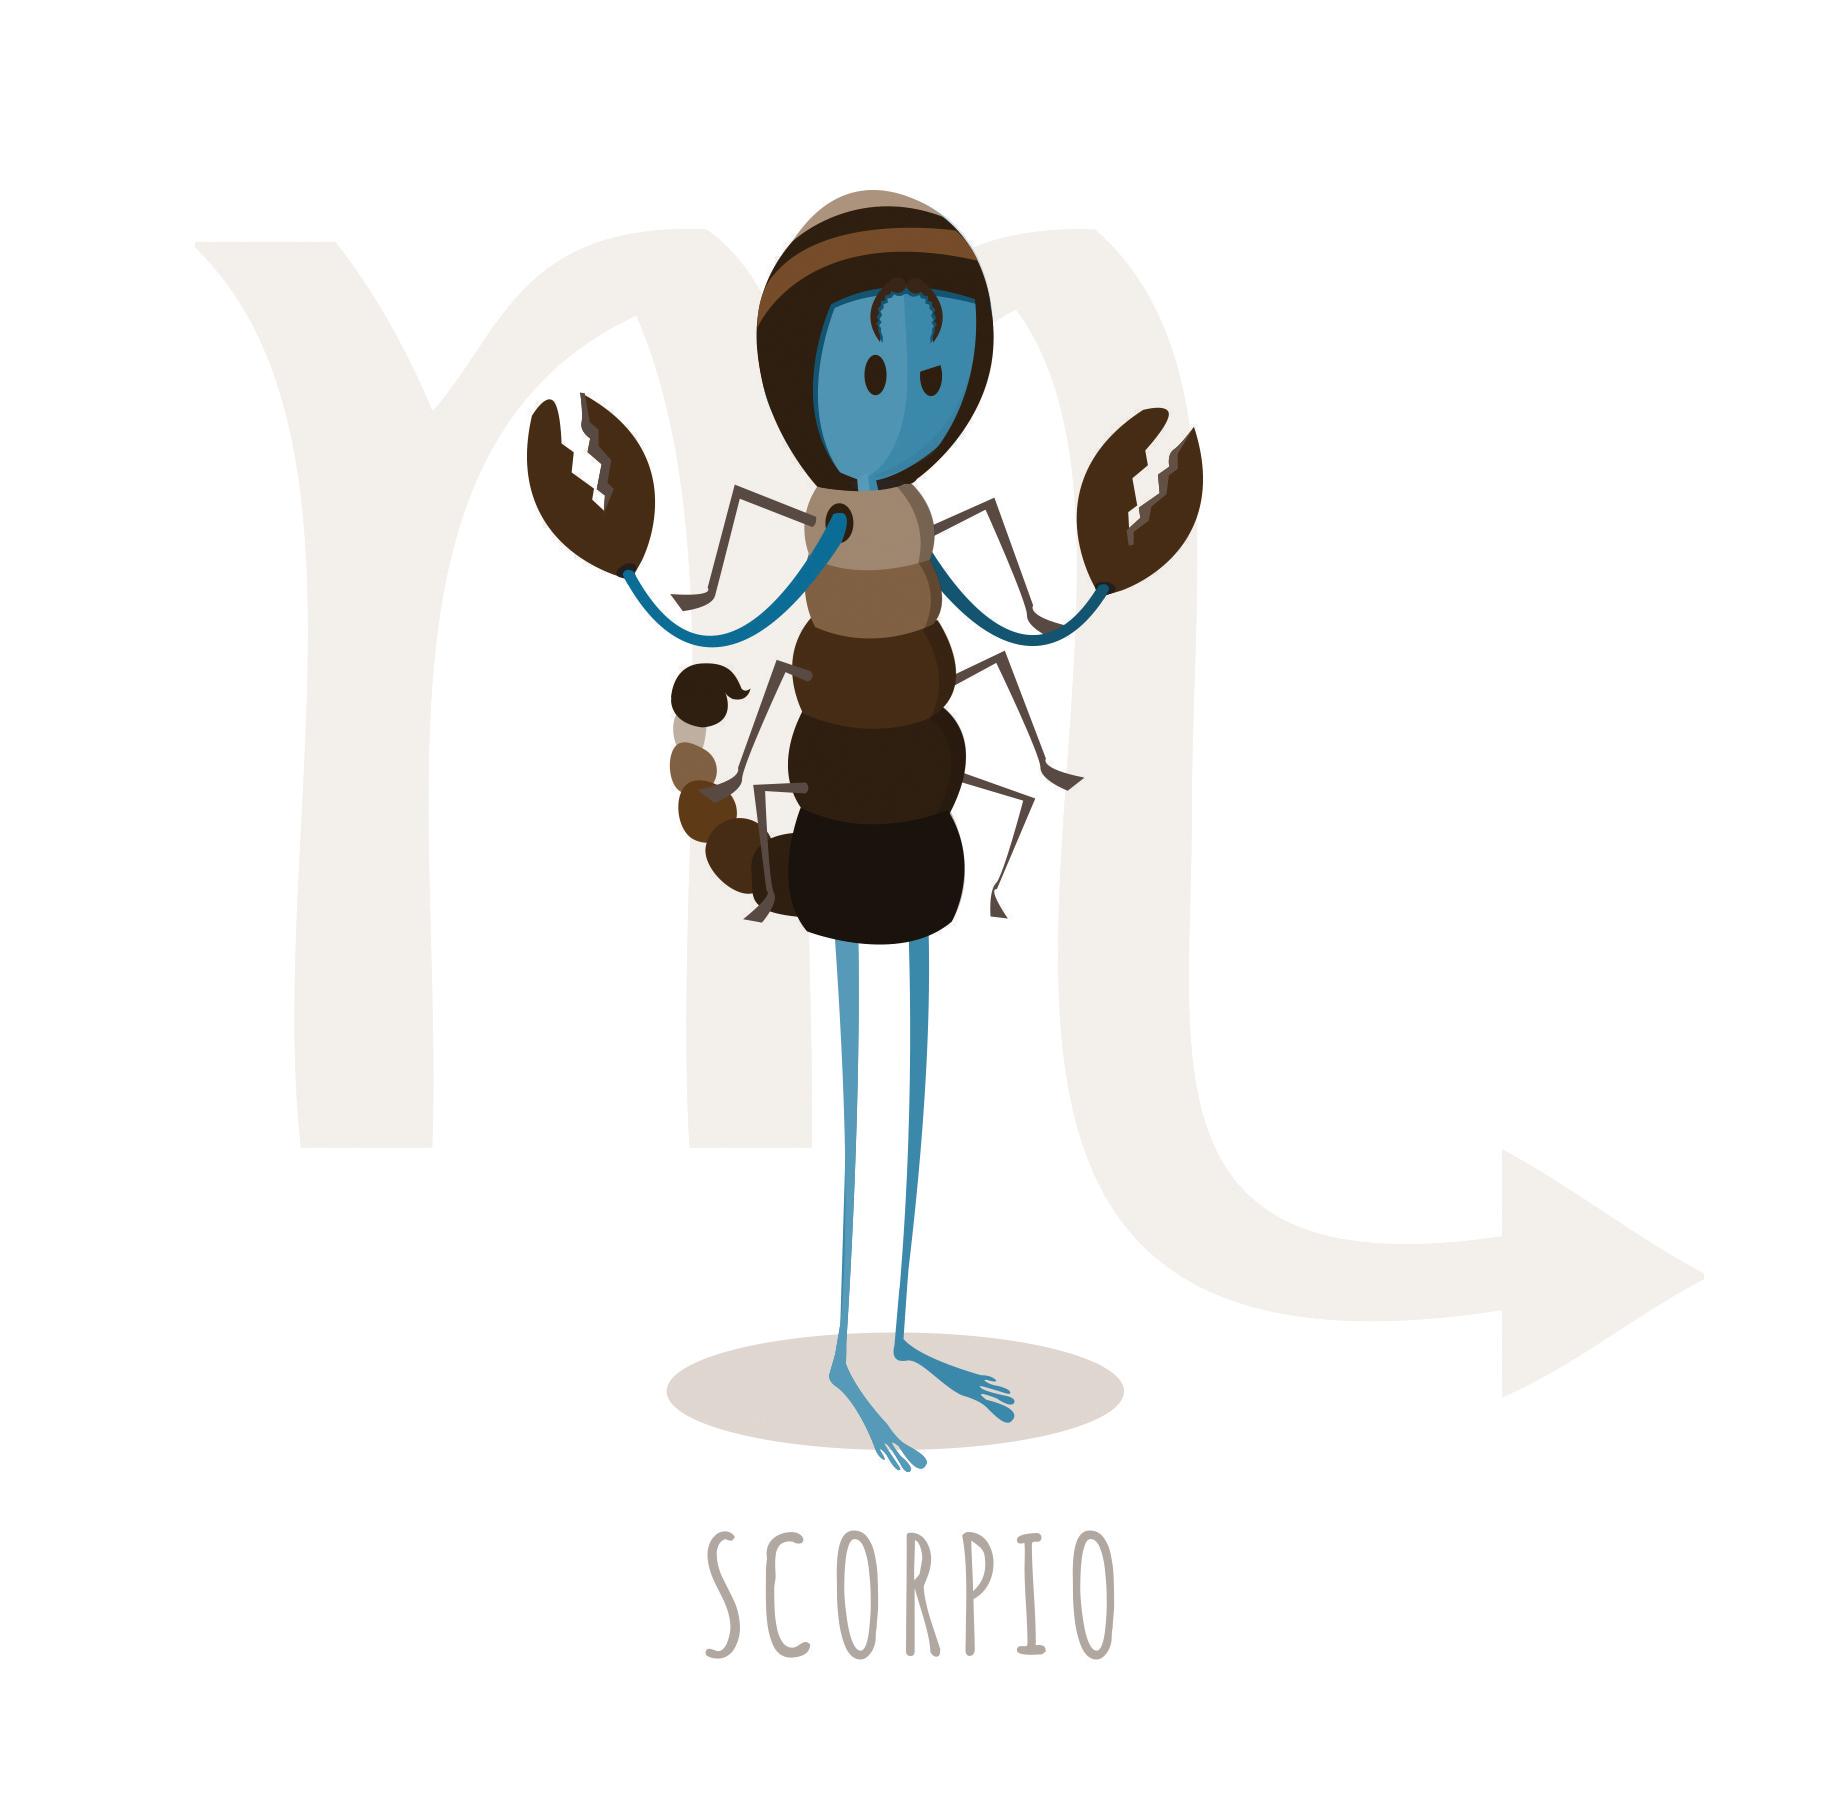 Scorpio zodiac illustrated greetings card wake up screaming an scorpio illustrated greetings card matt witt illustration kristyandbryce Image collections